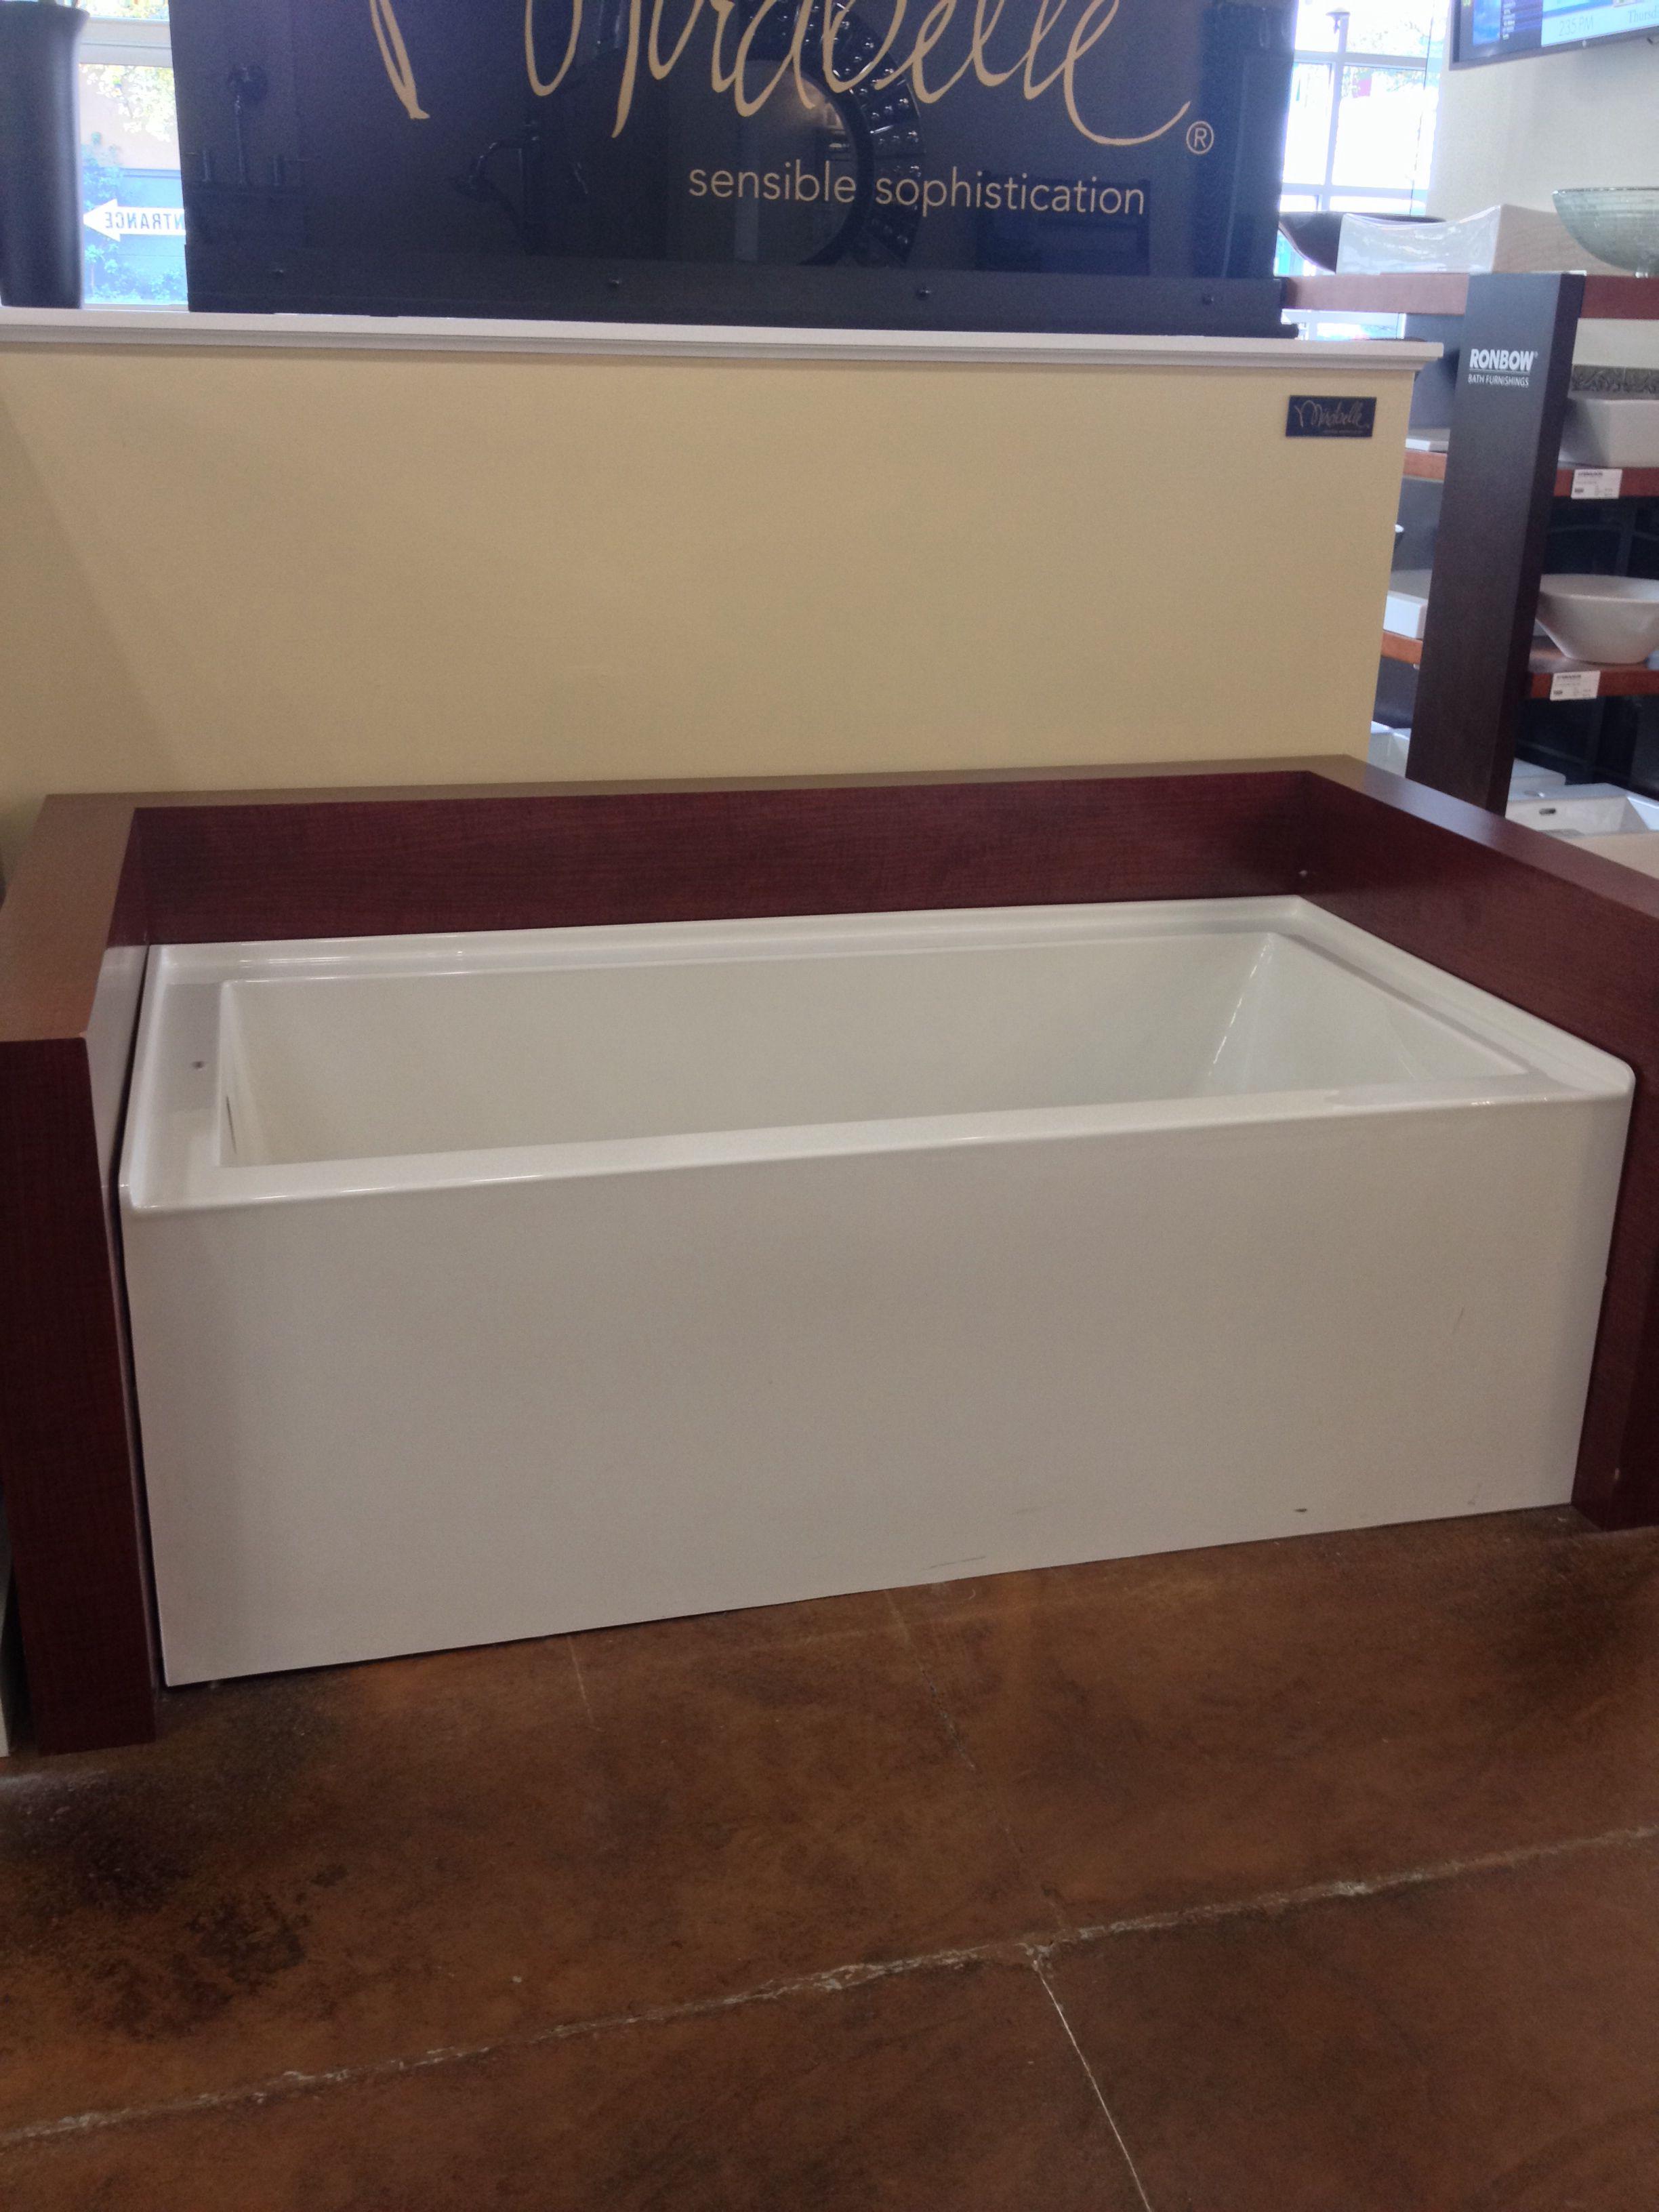 mirabelle edenton tub at ferguson showroom